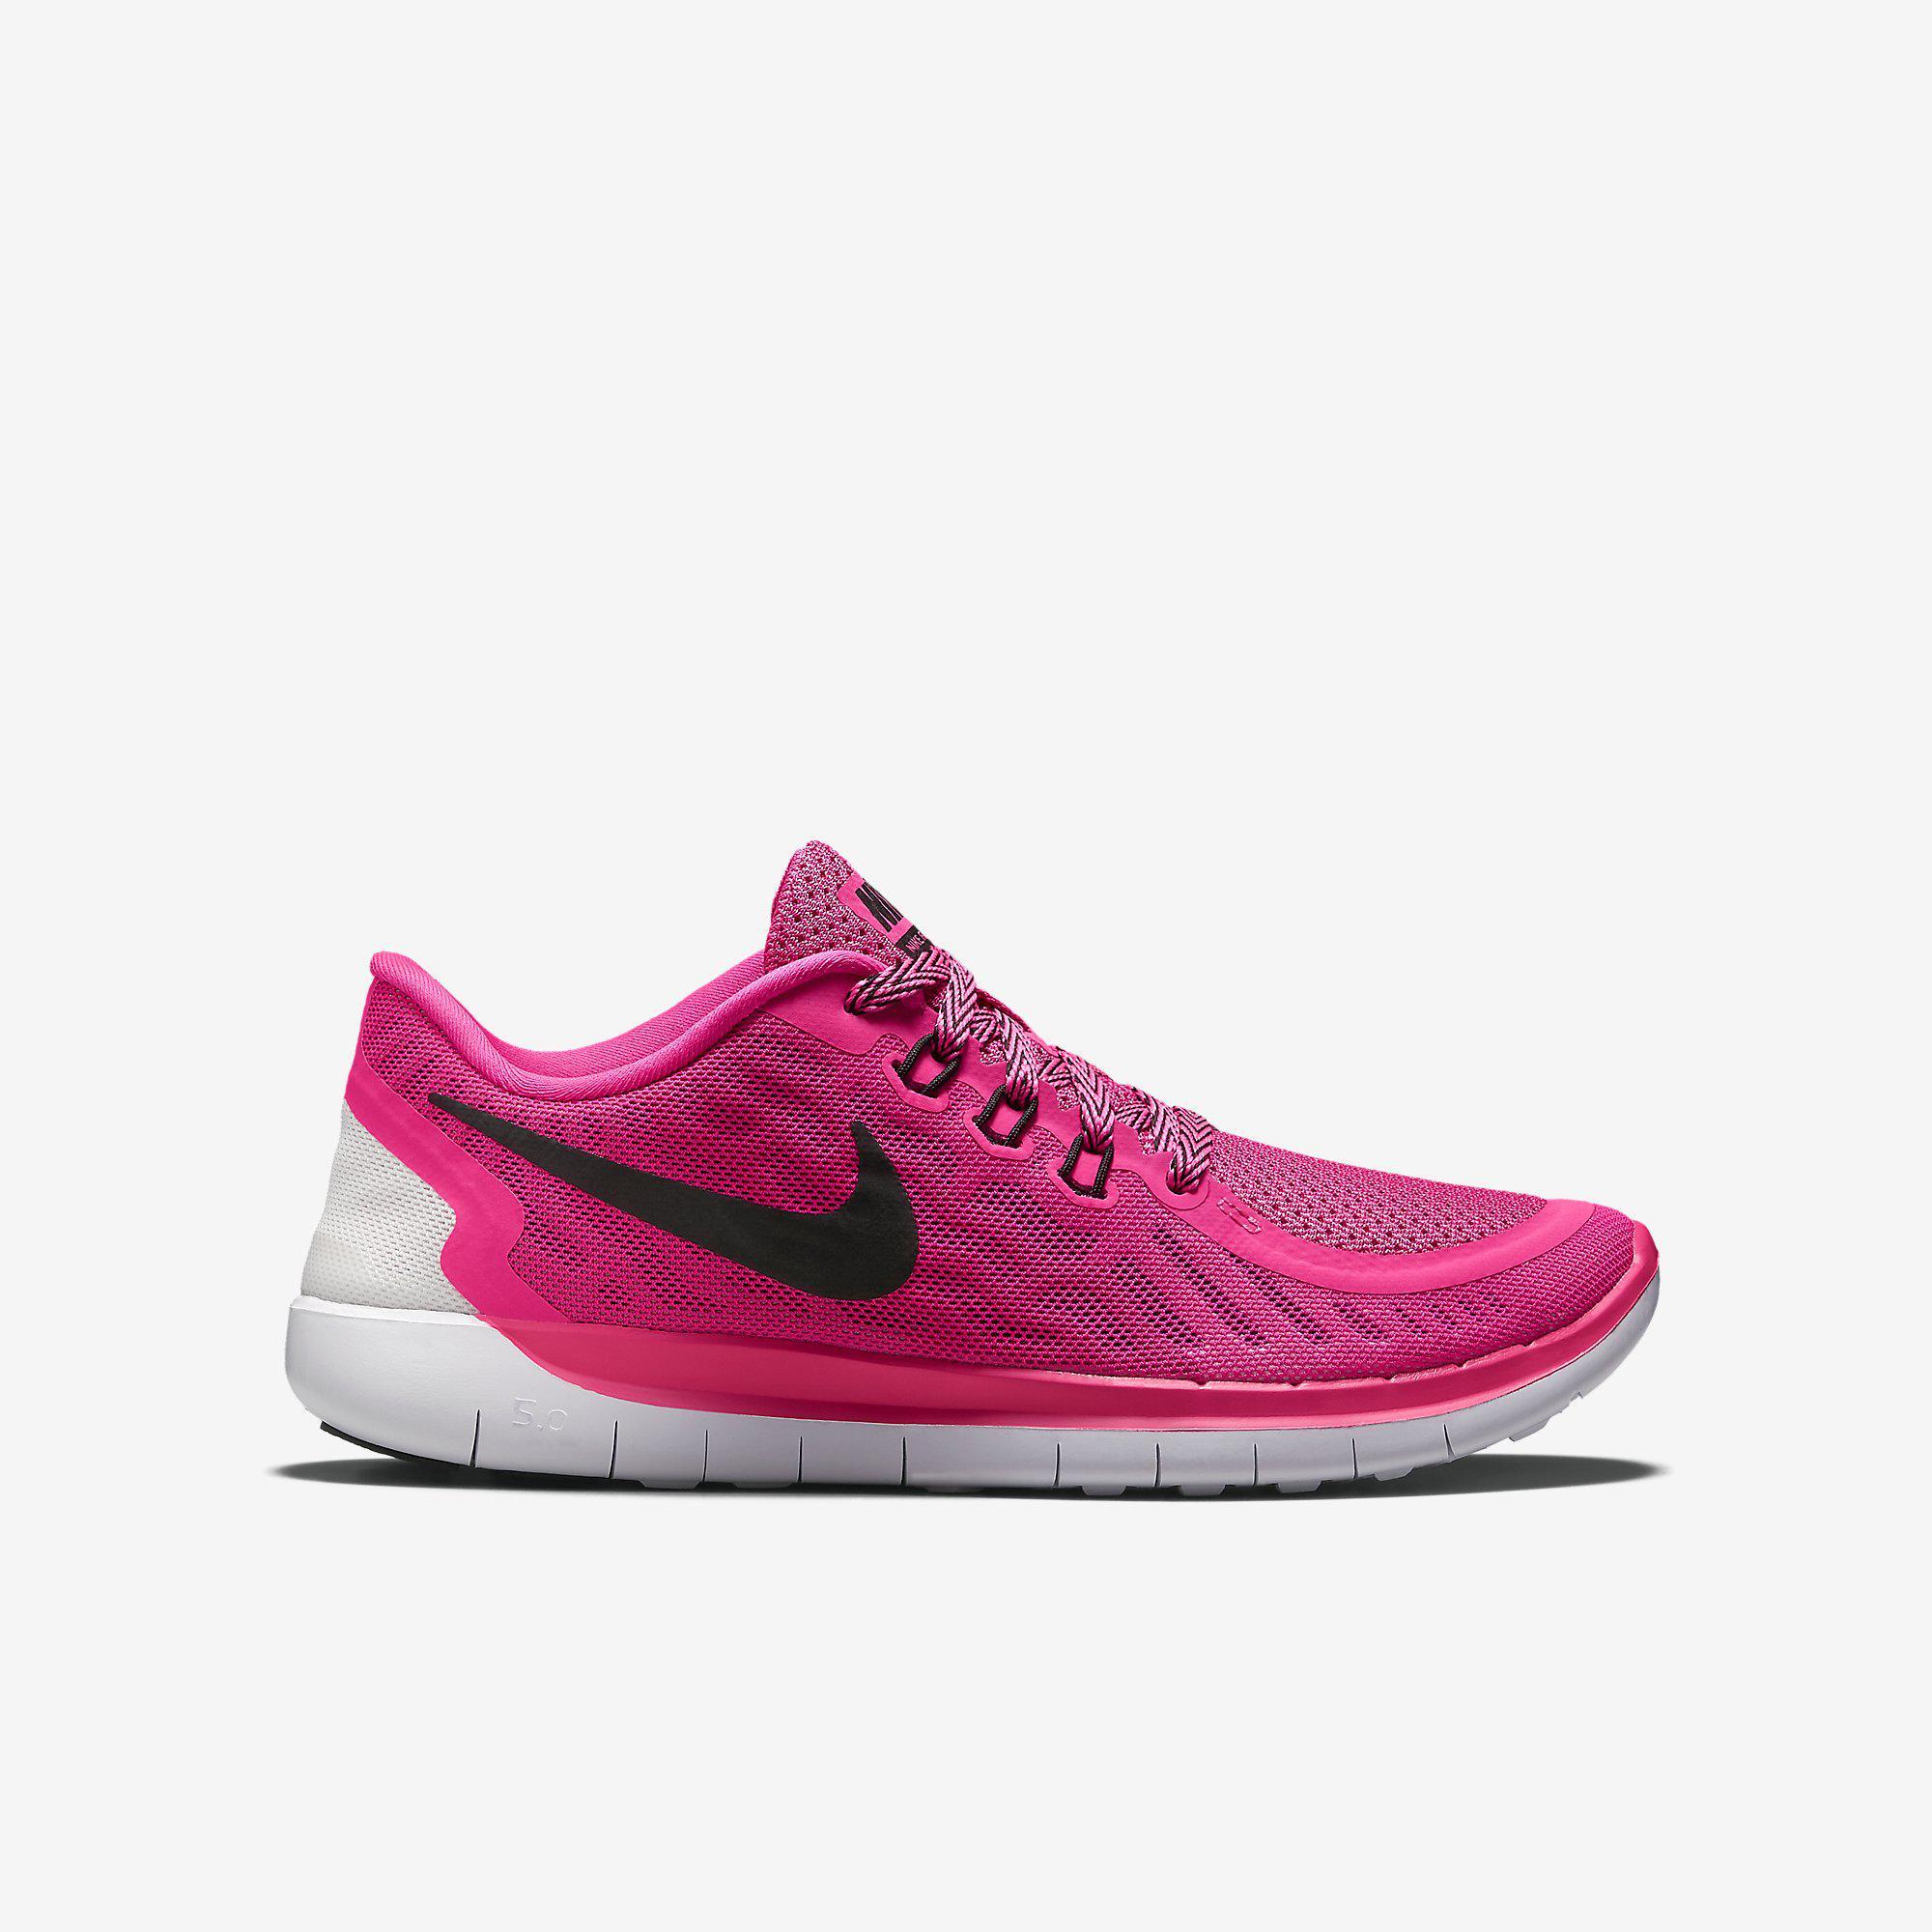 info for c86fc ab414 Nike Girls Free 5.0 Running Shoes - Pink Pow Vivid Pink - Tennisnuts.com